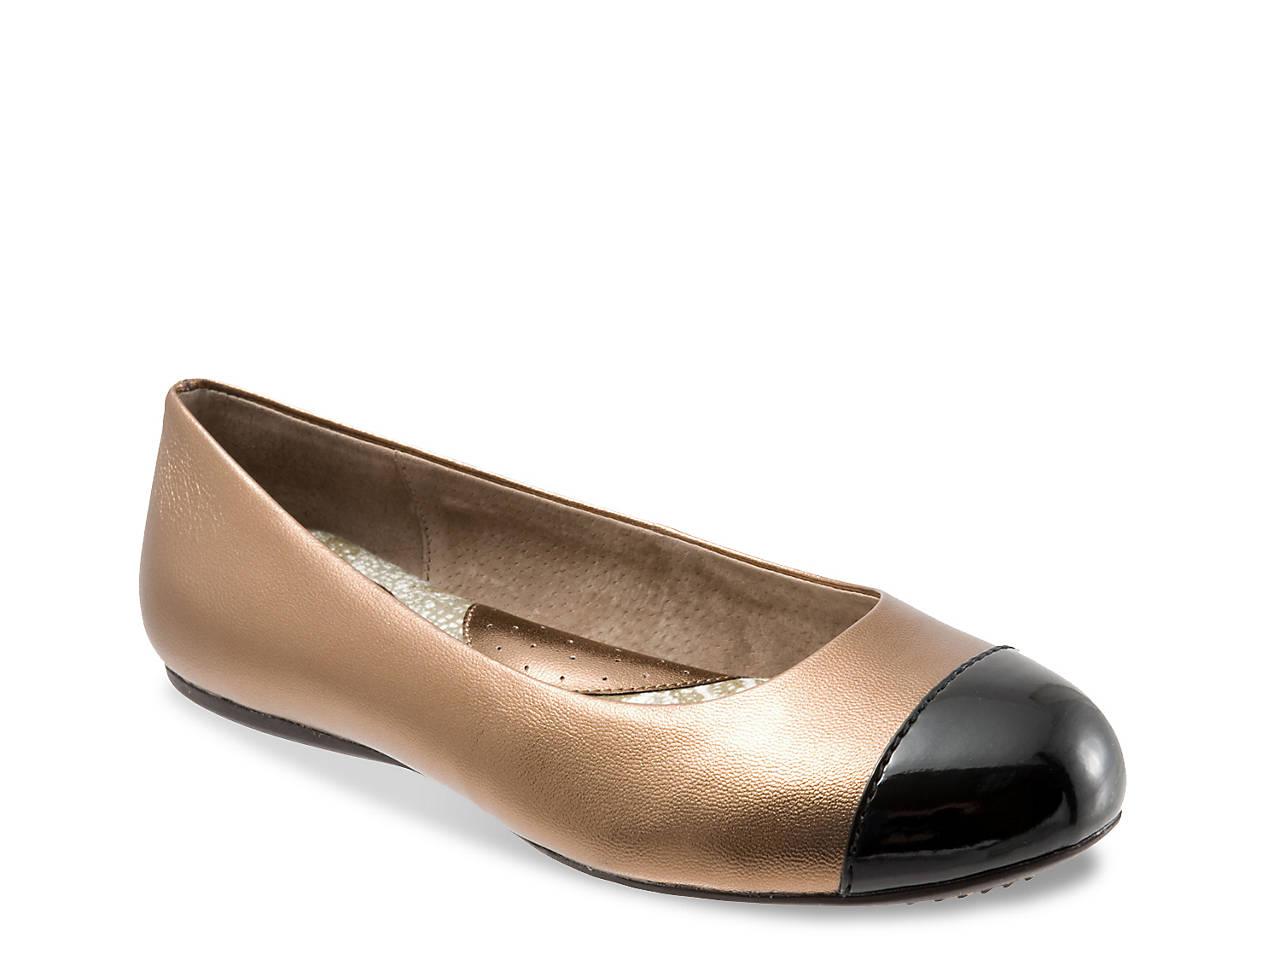 Softwalk Napa Ballerina Flat If3eOIc